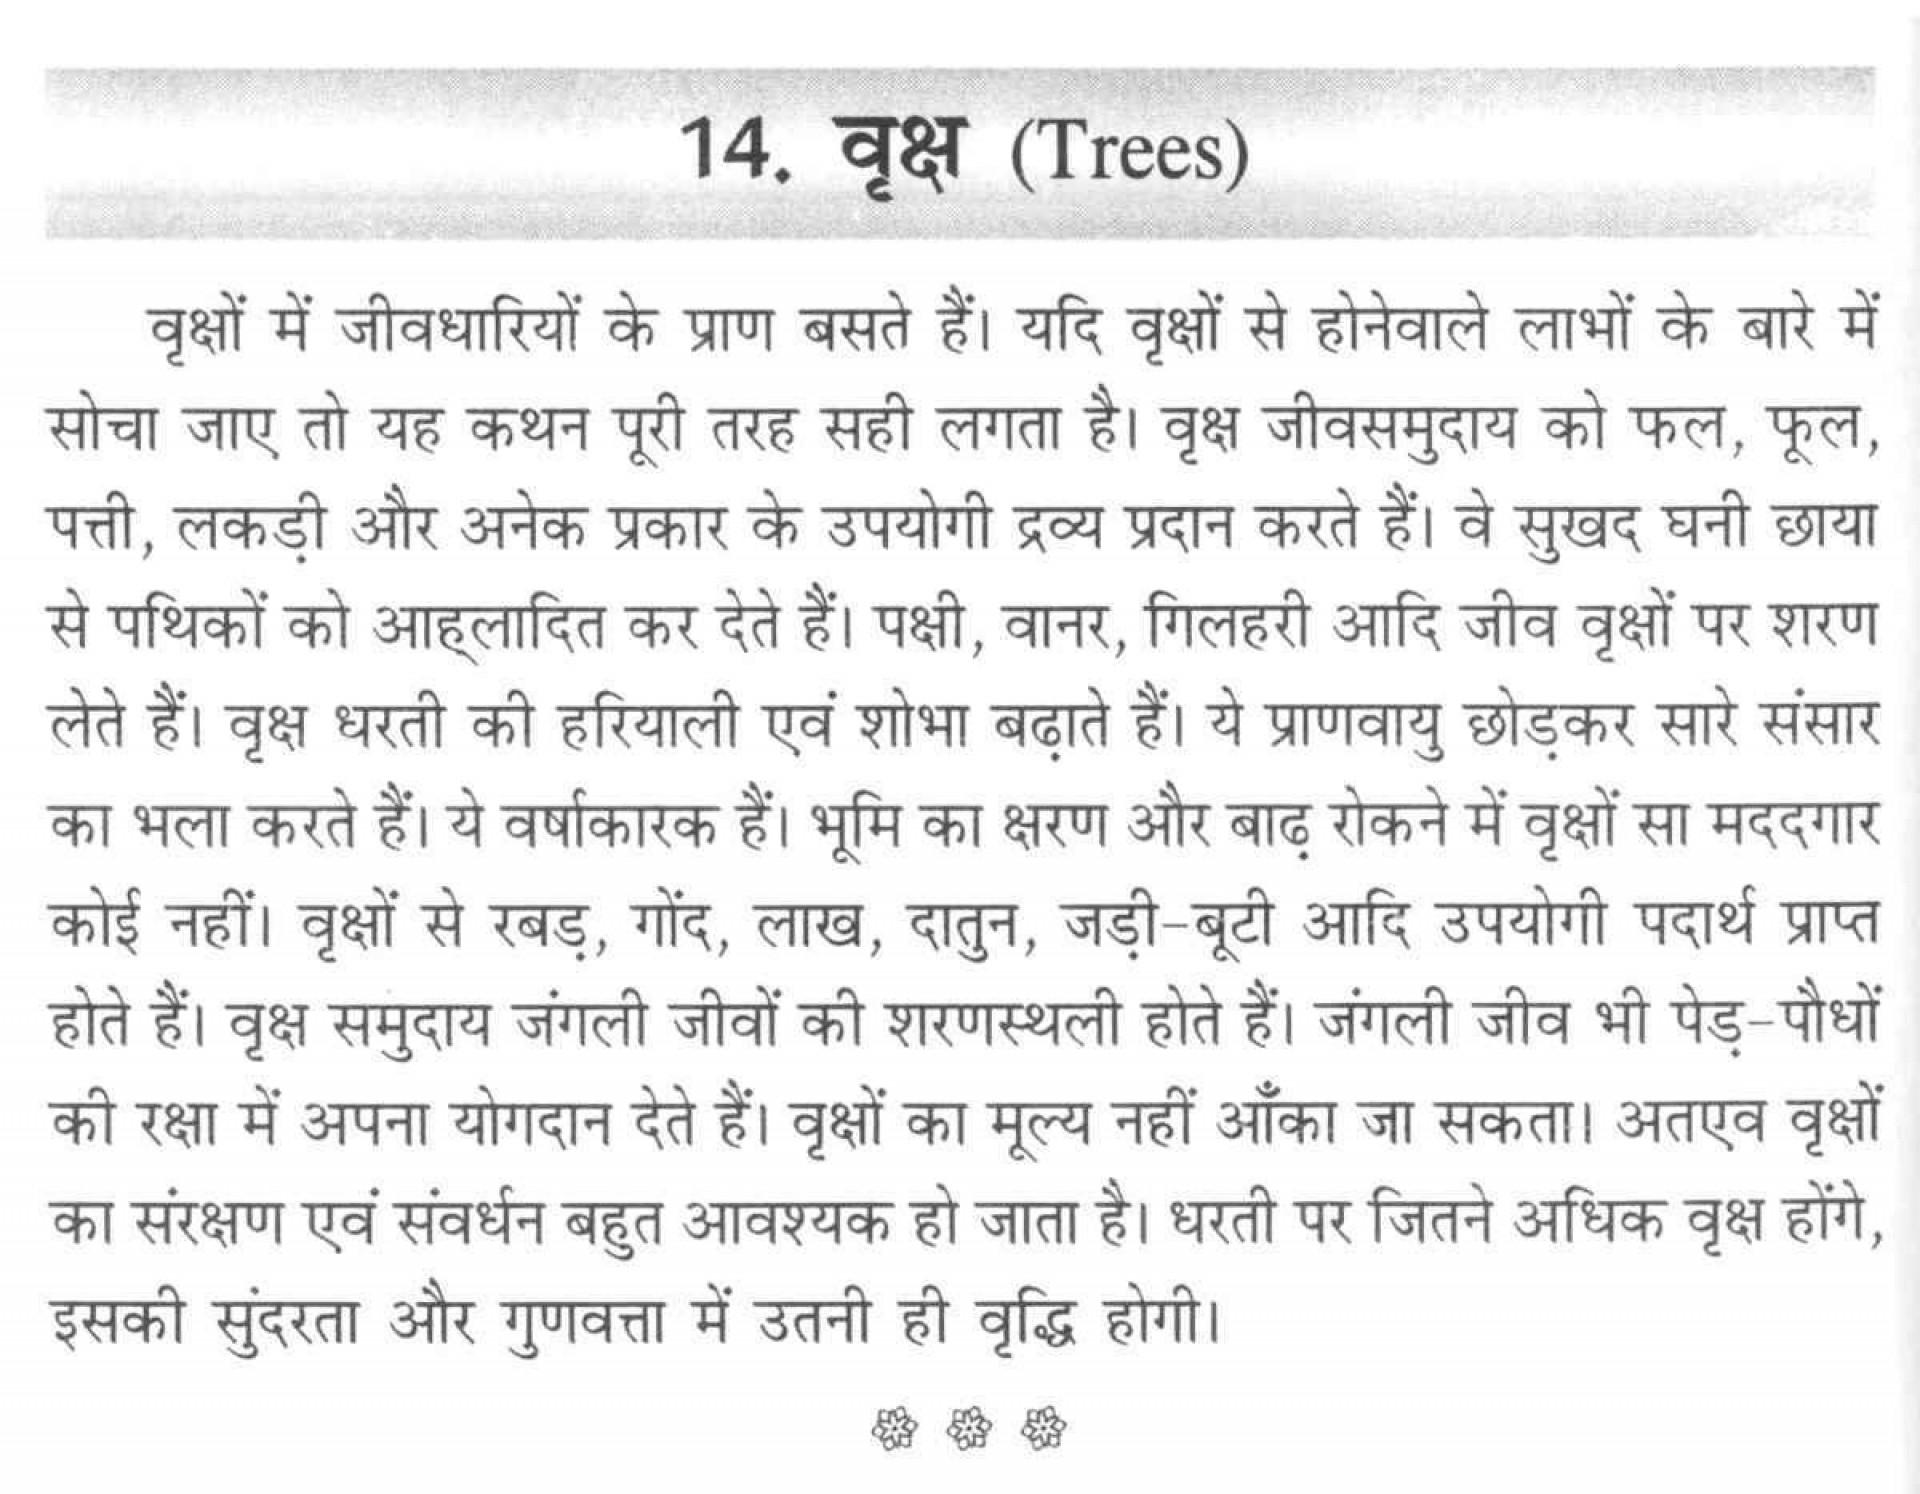 peepal tree essay in sanskrit